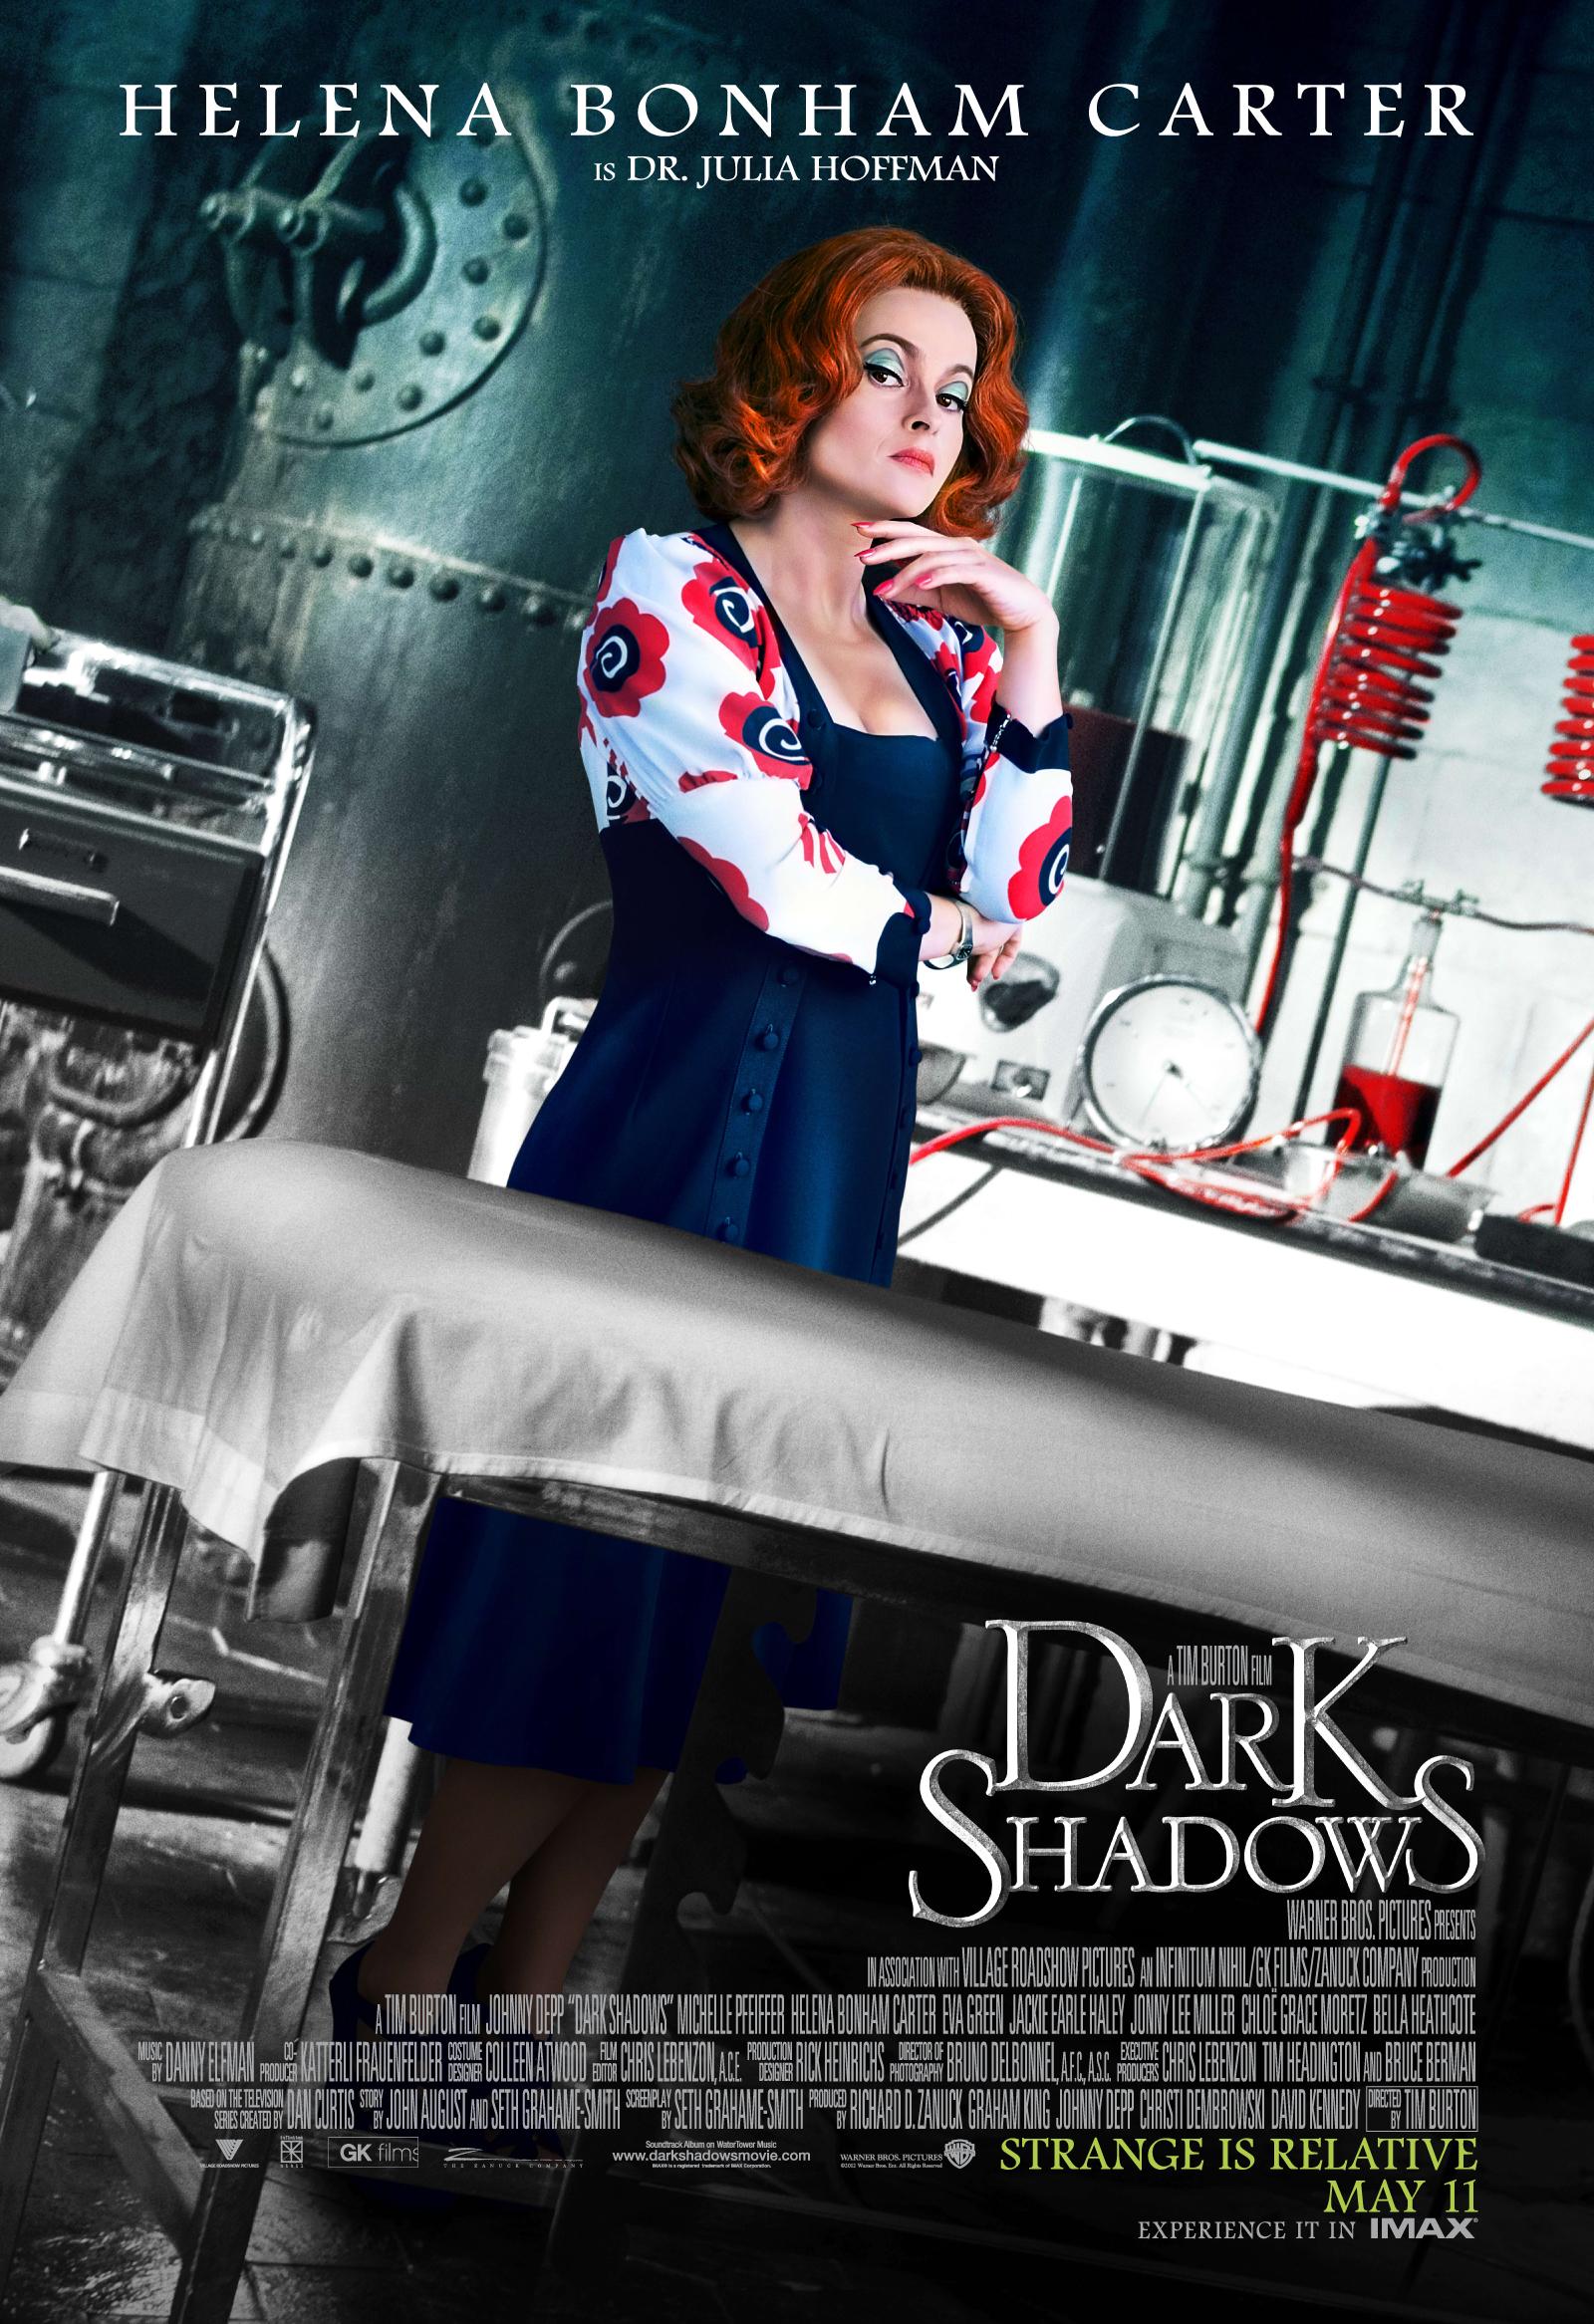 darkshadowsnewhbc.jpg